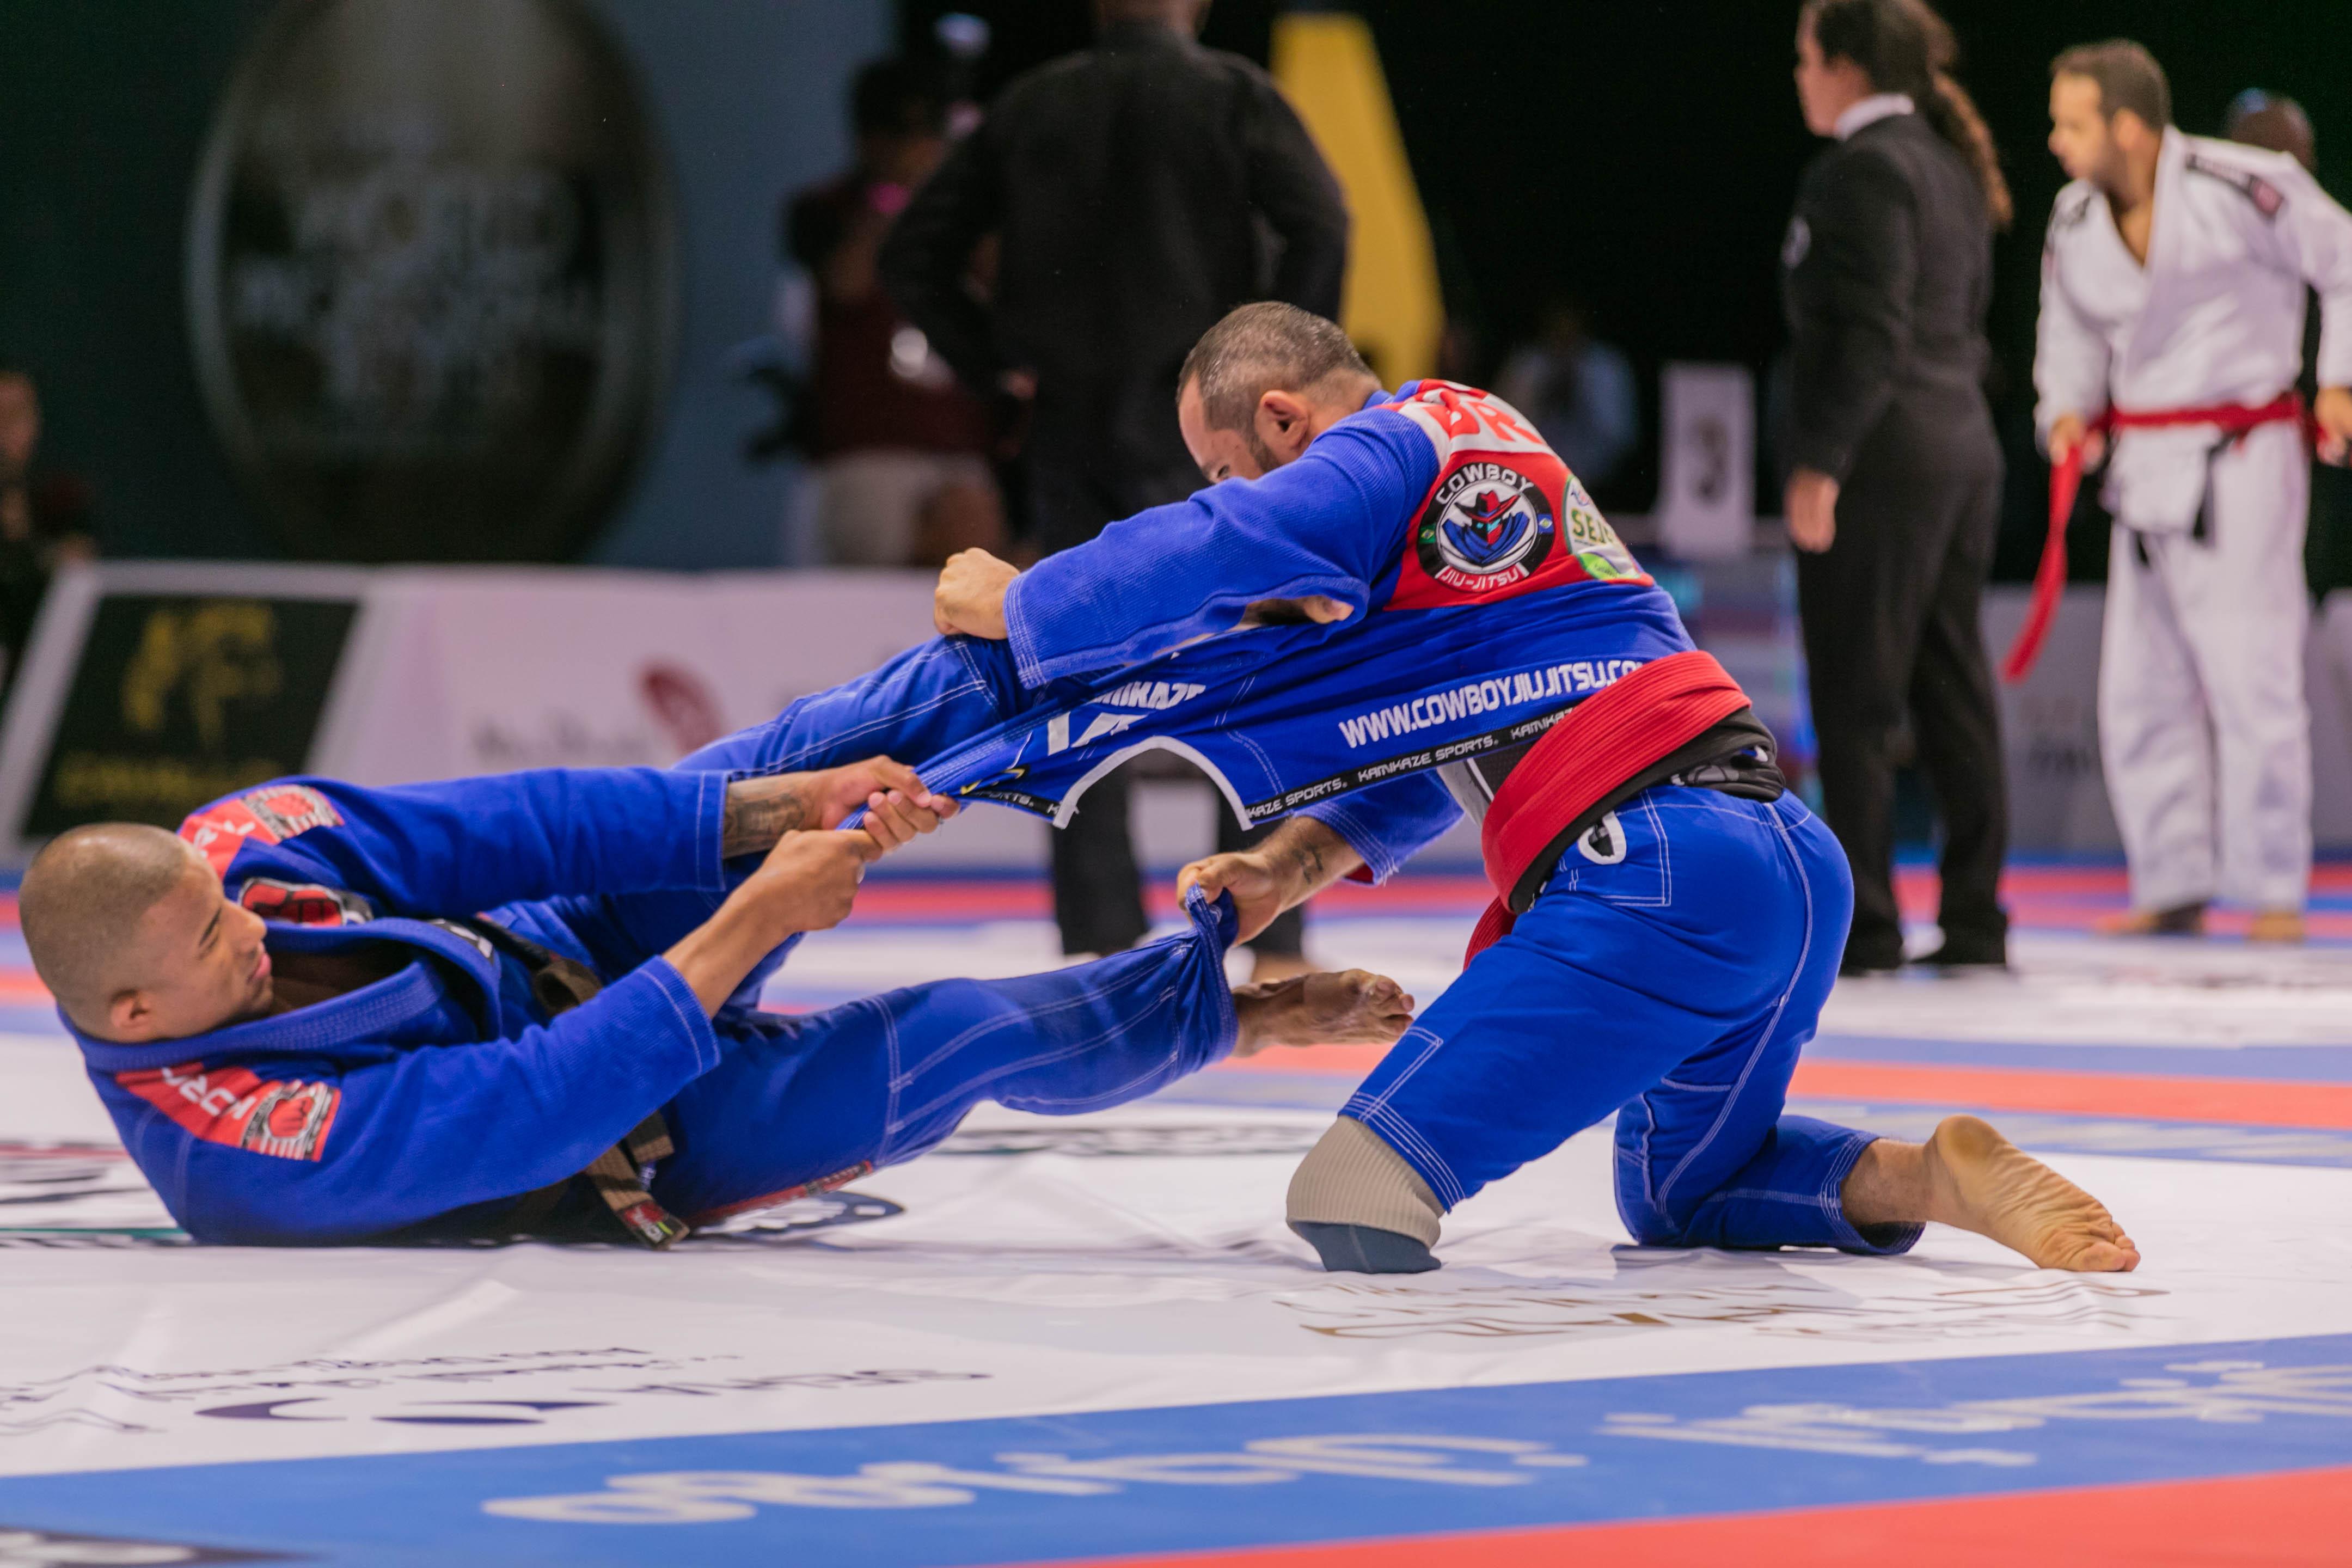 global athletes to partake in abu dhabi world professional jiu-jitsu championship in april 2